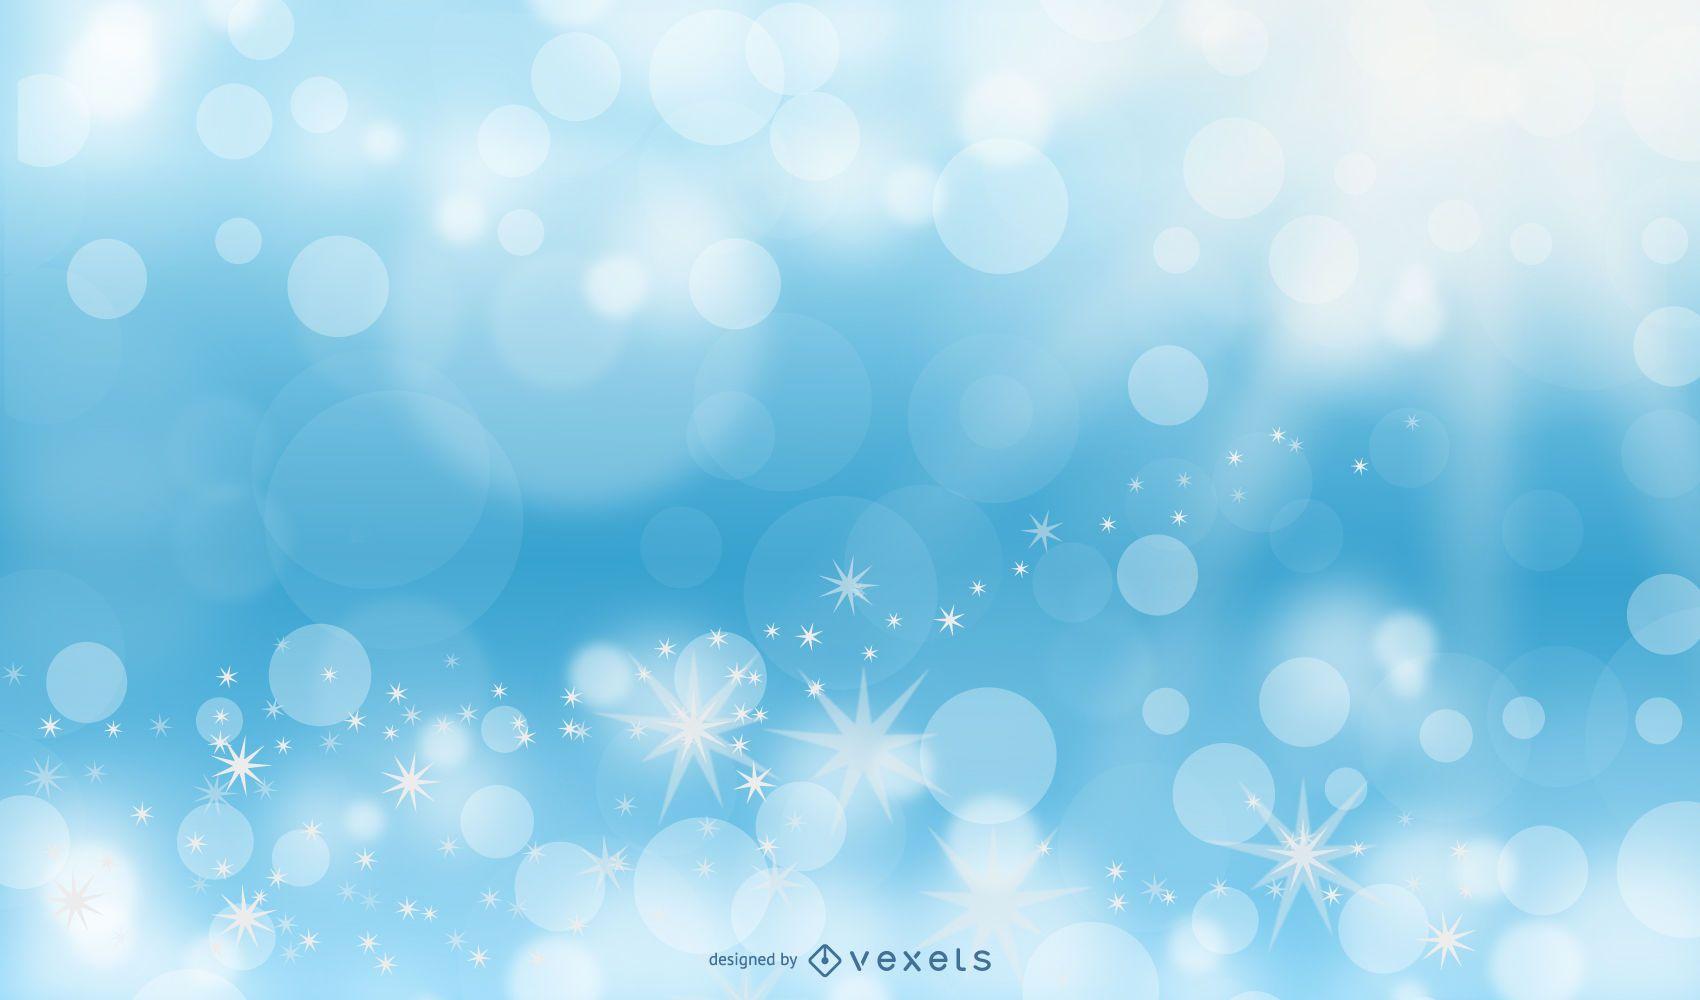 Blue Sparkle and Bokeh Lights Background Design